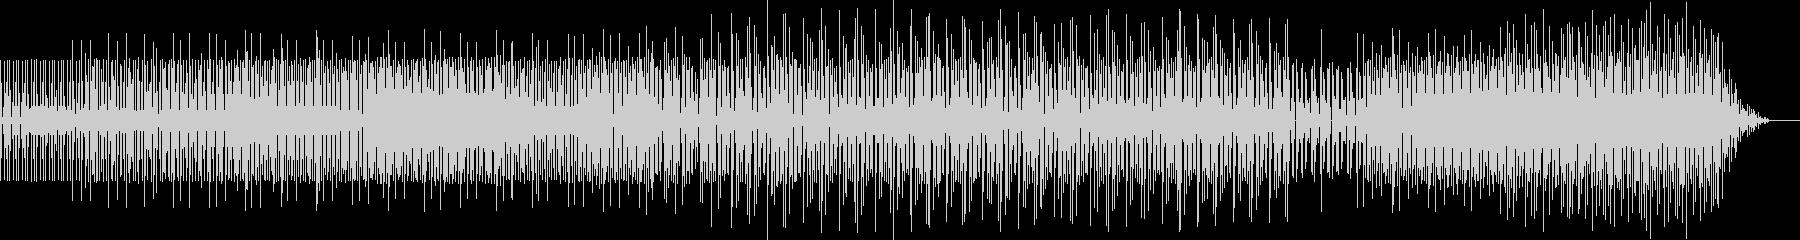 draho_northtの未再生の波形